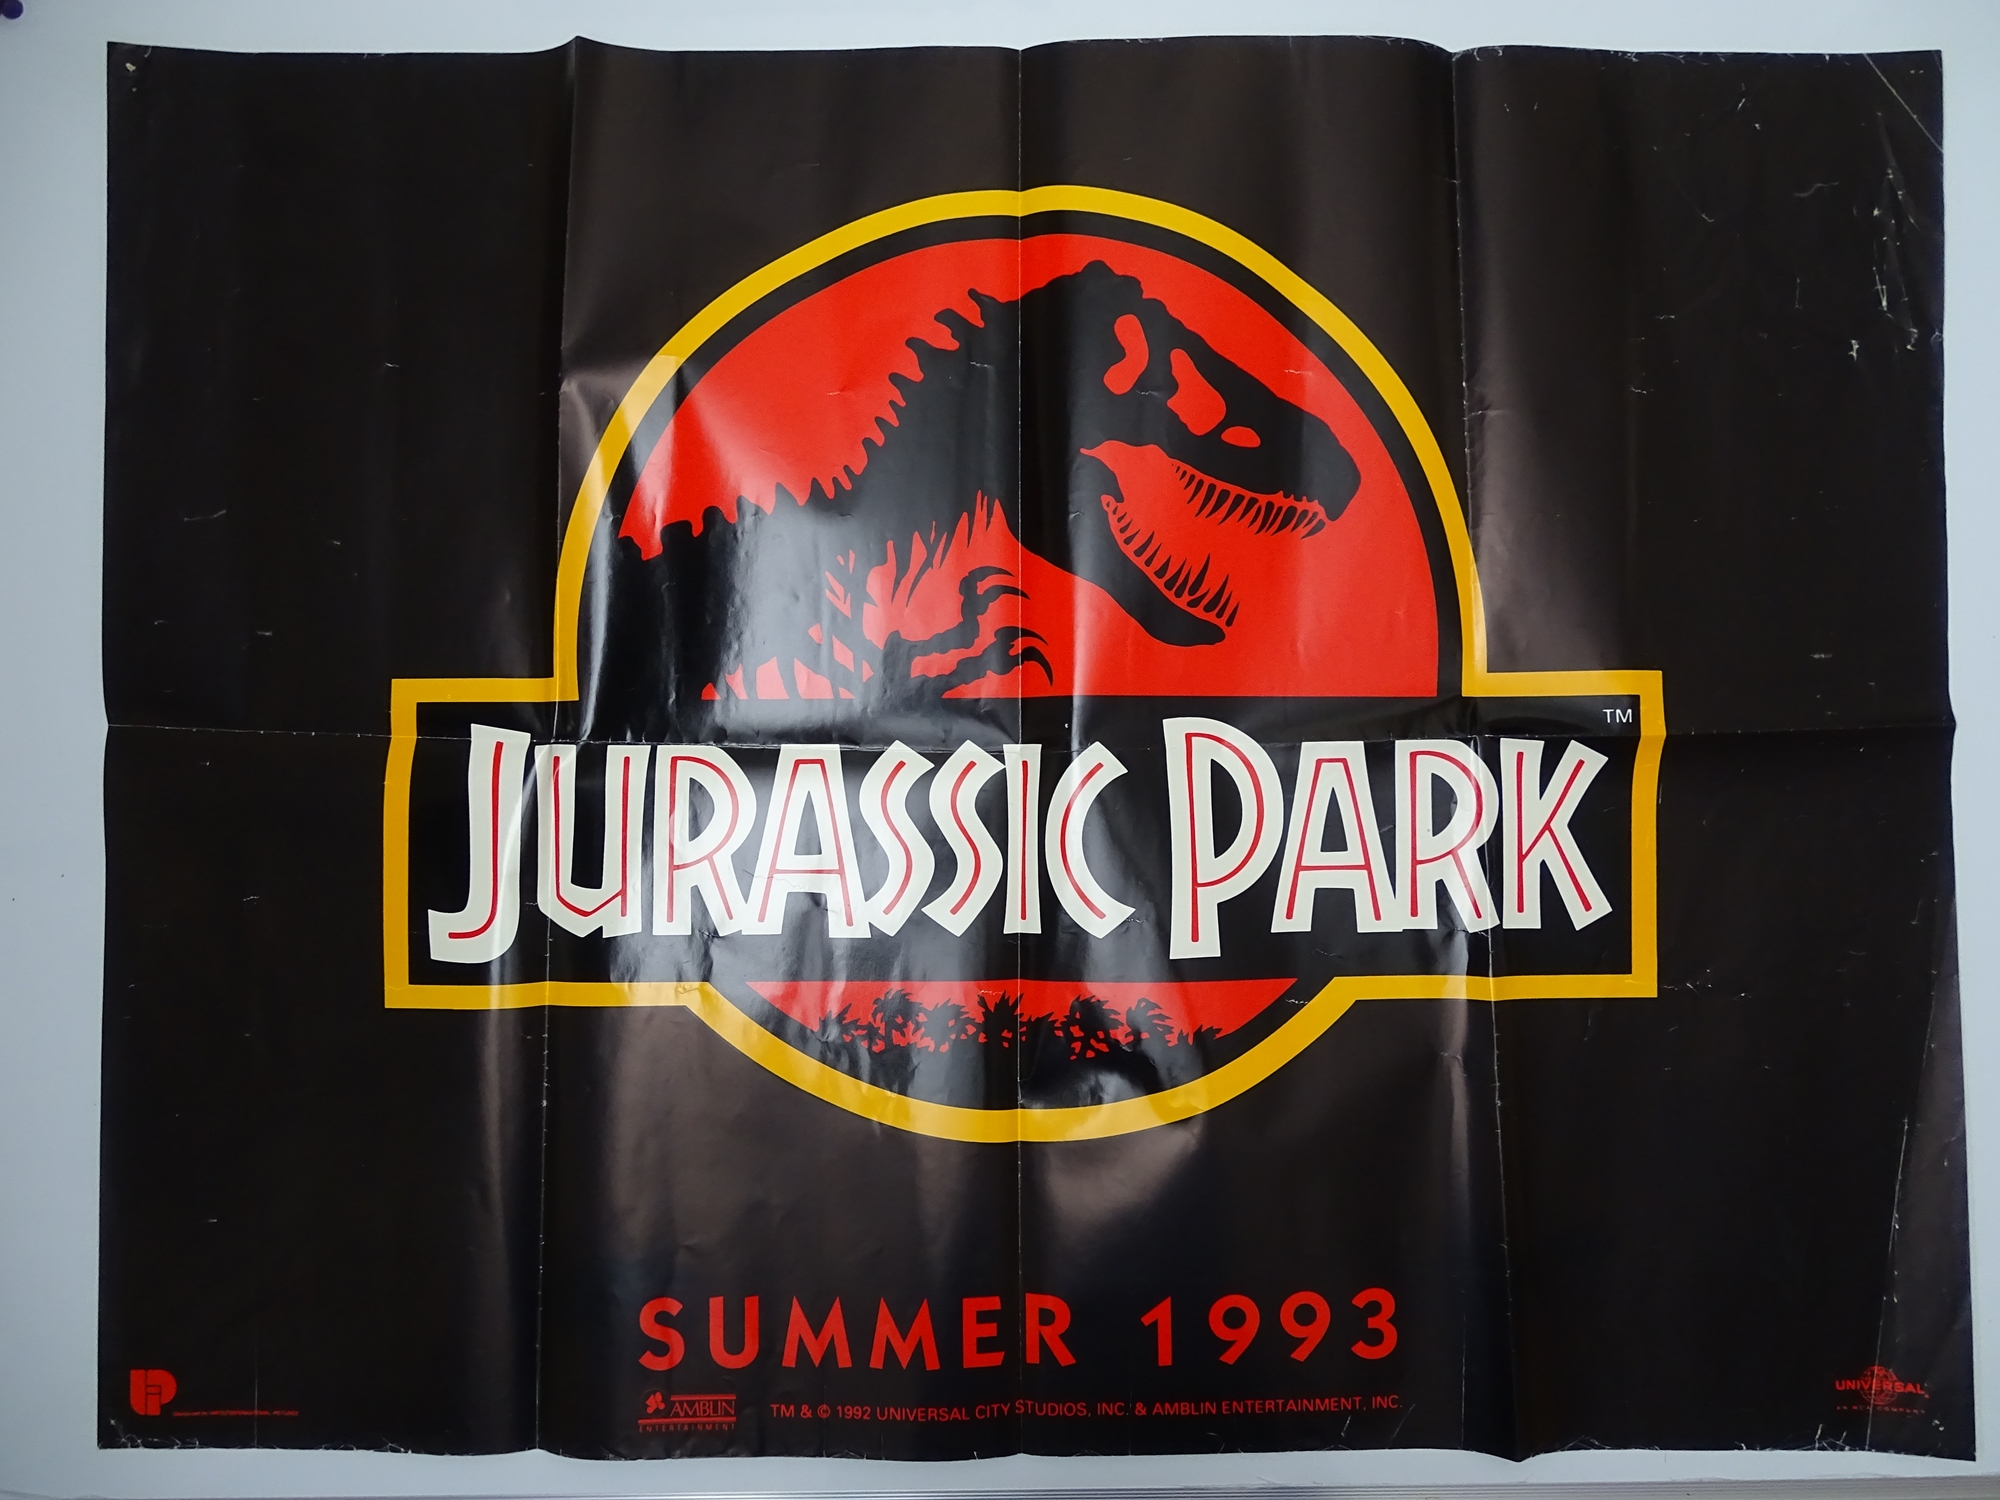 JURASSIC PARK (1993) - British UK quad film poster - Advance - STEVEN SPIELBERG - Classic T-REX logo